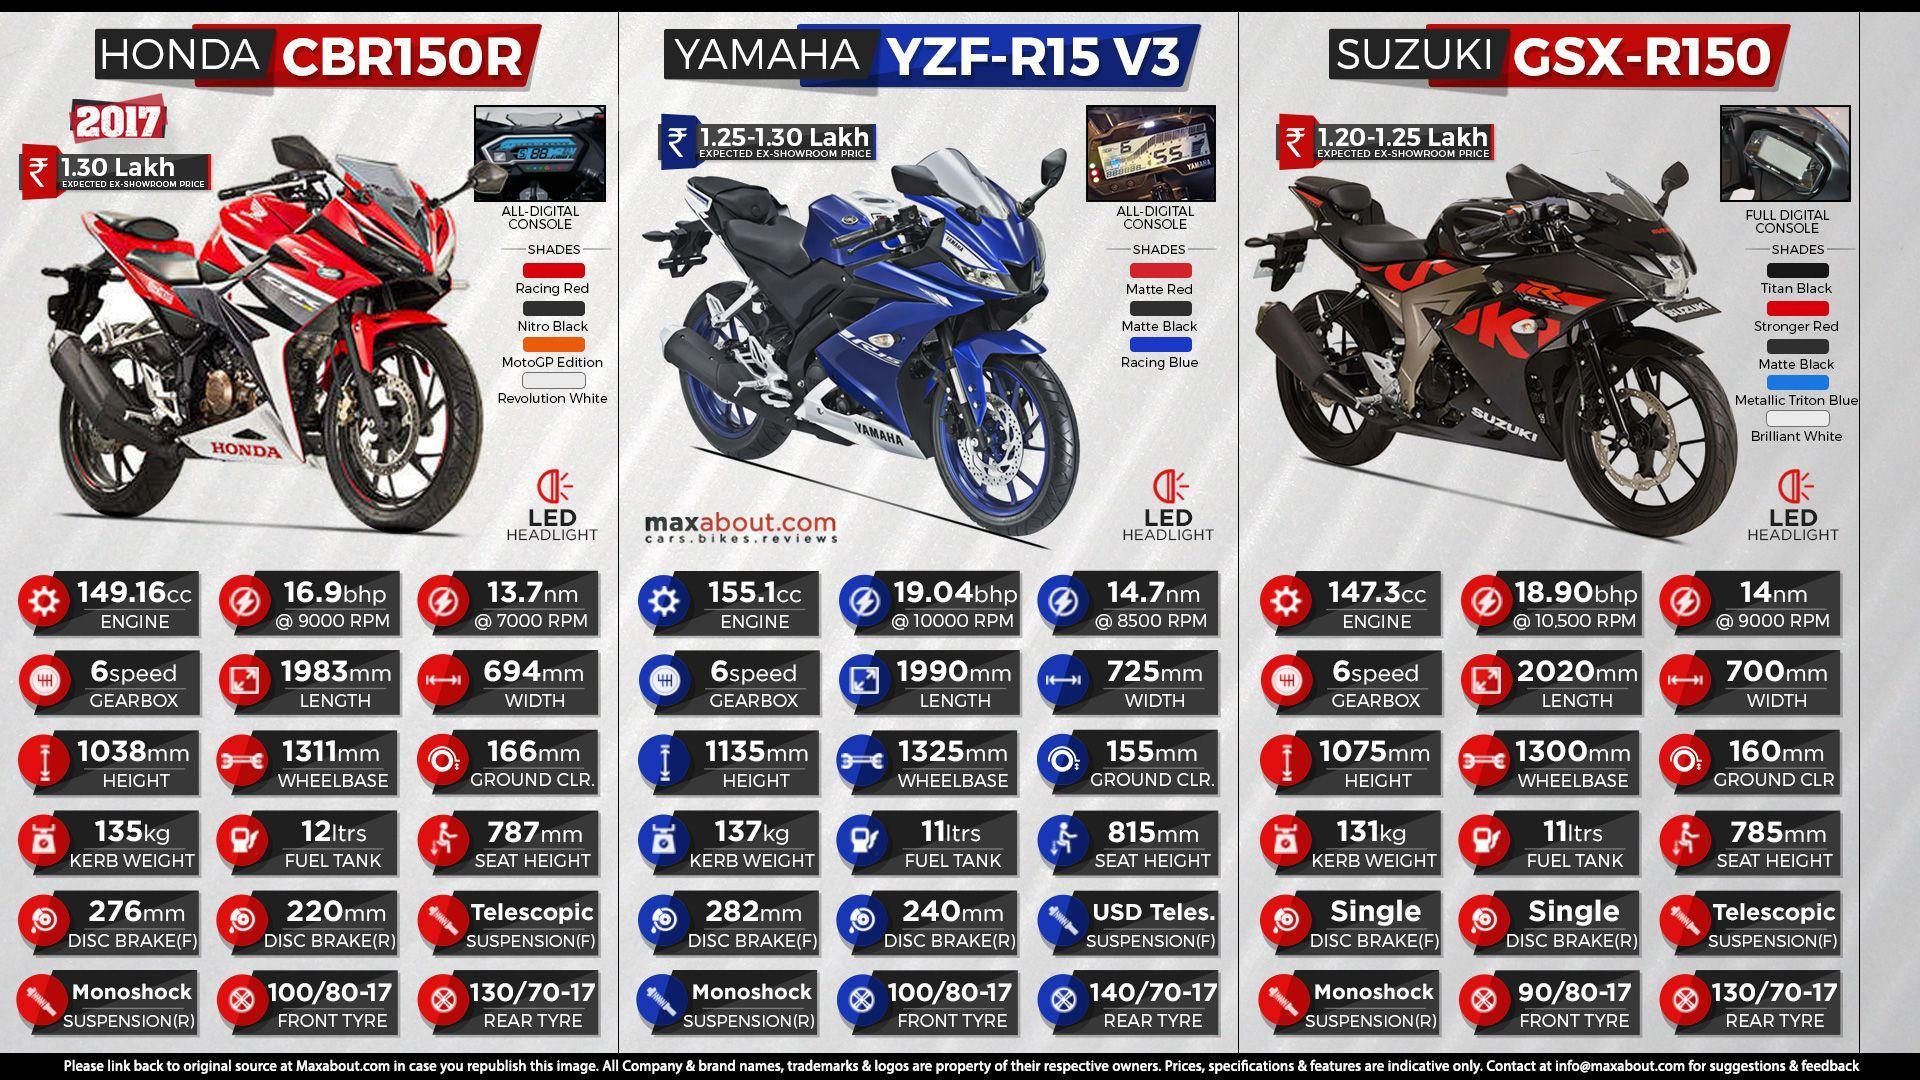 Yamaha Yzf R15 V3 Wallpapers Wallpaper Cave